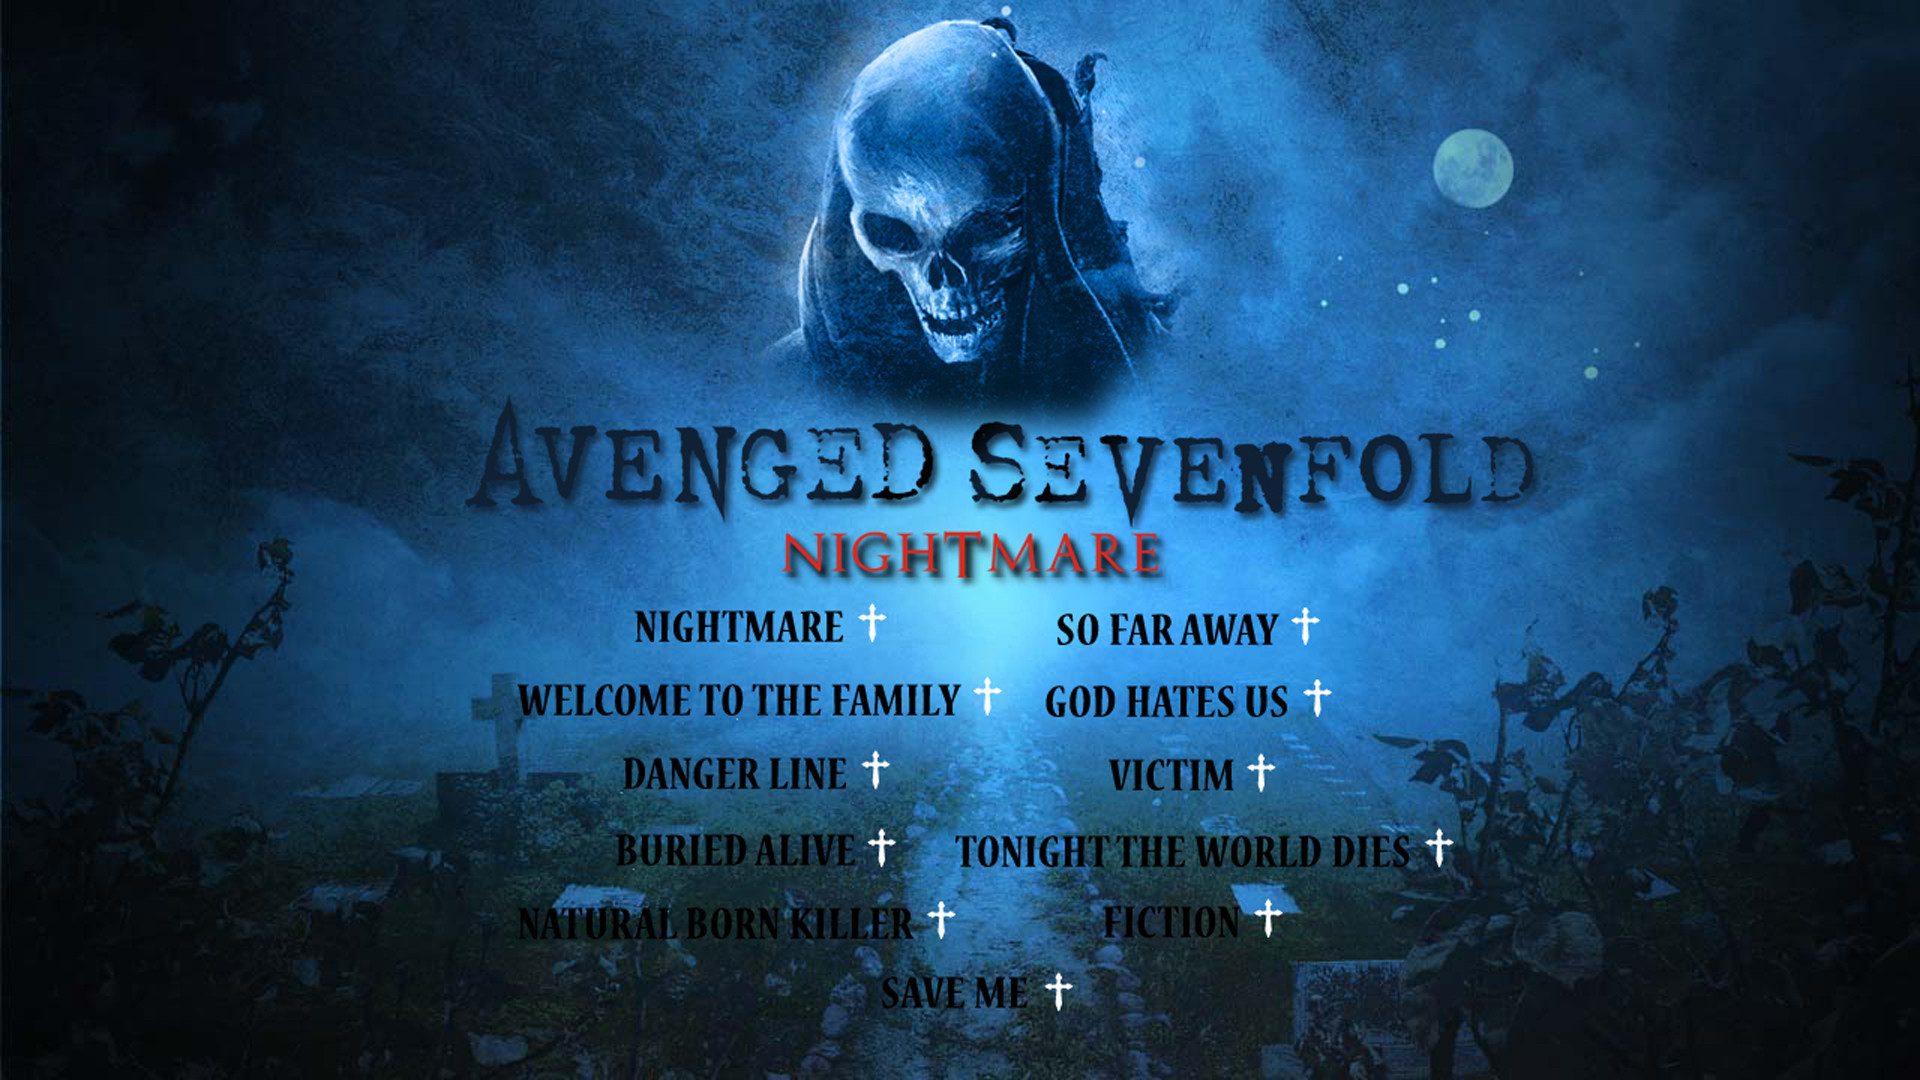 avenged sevenfold hd wallpaper